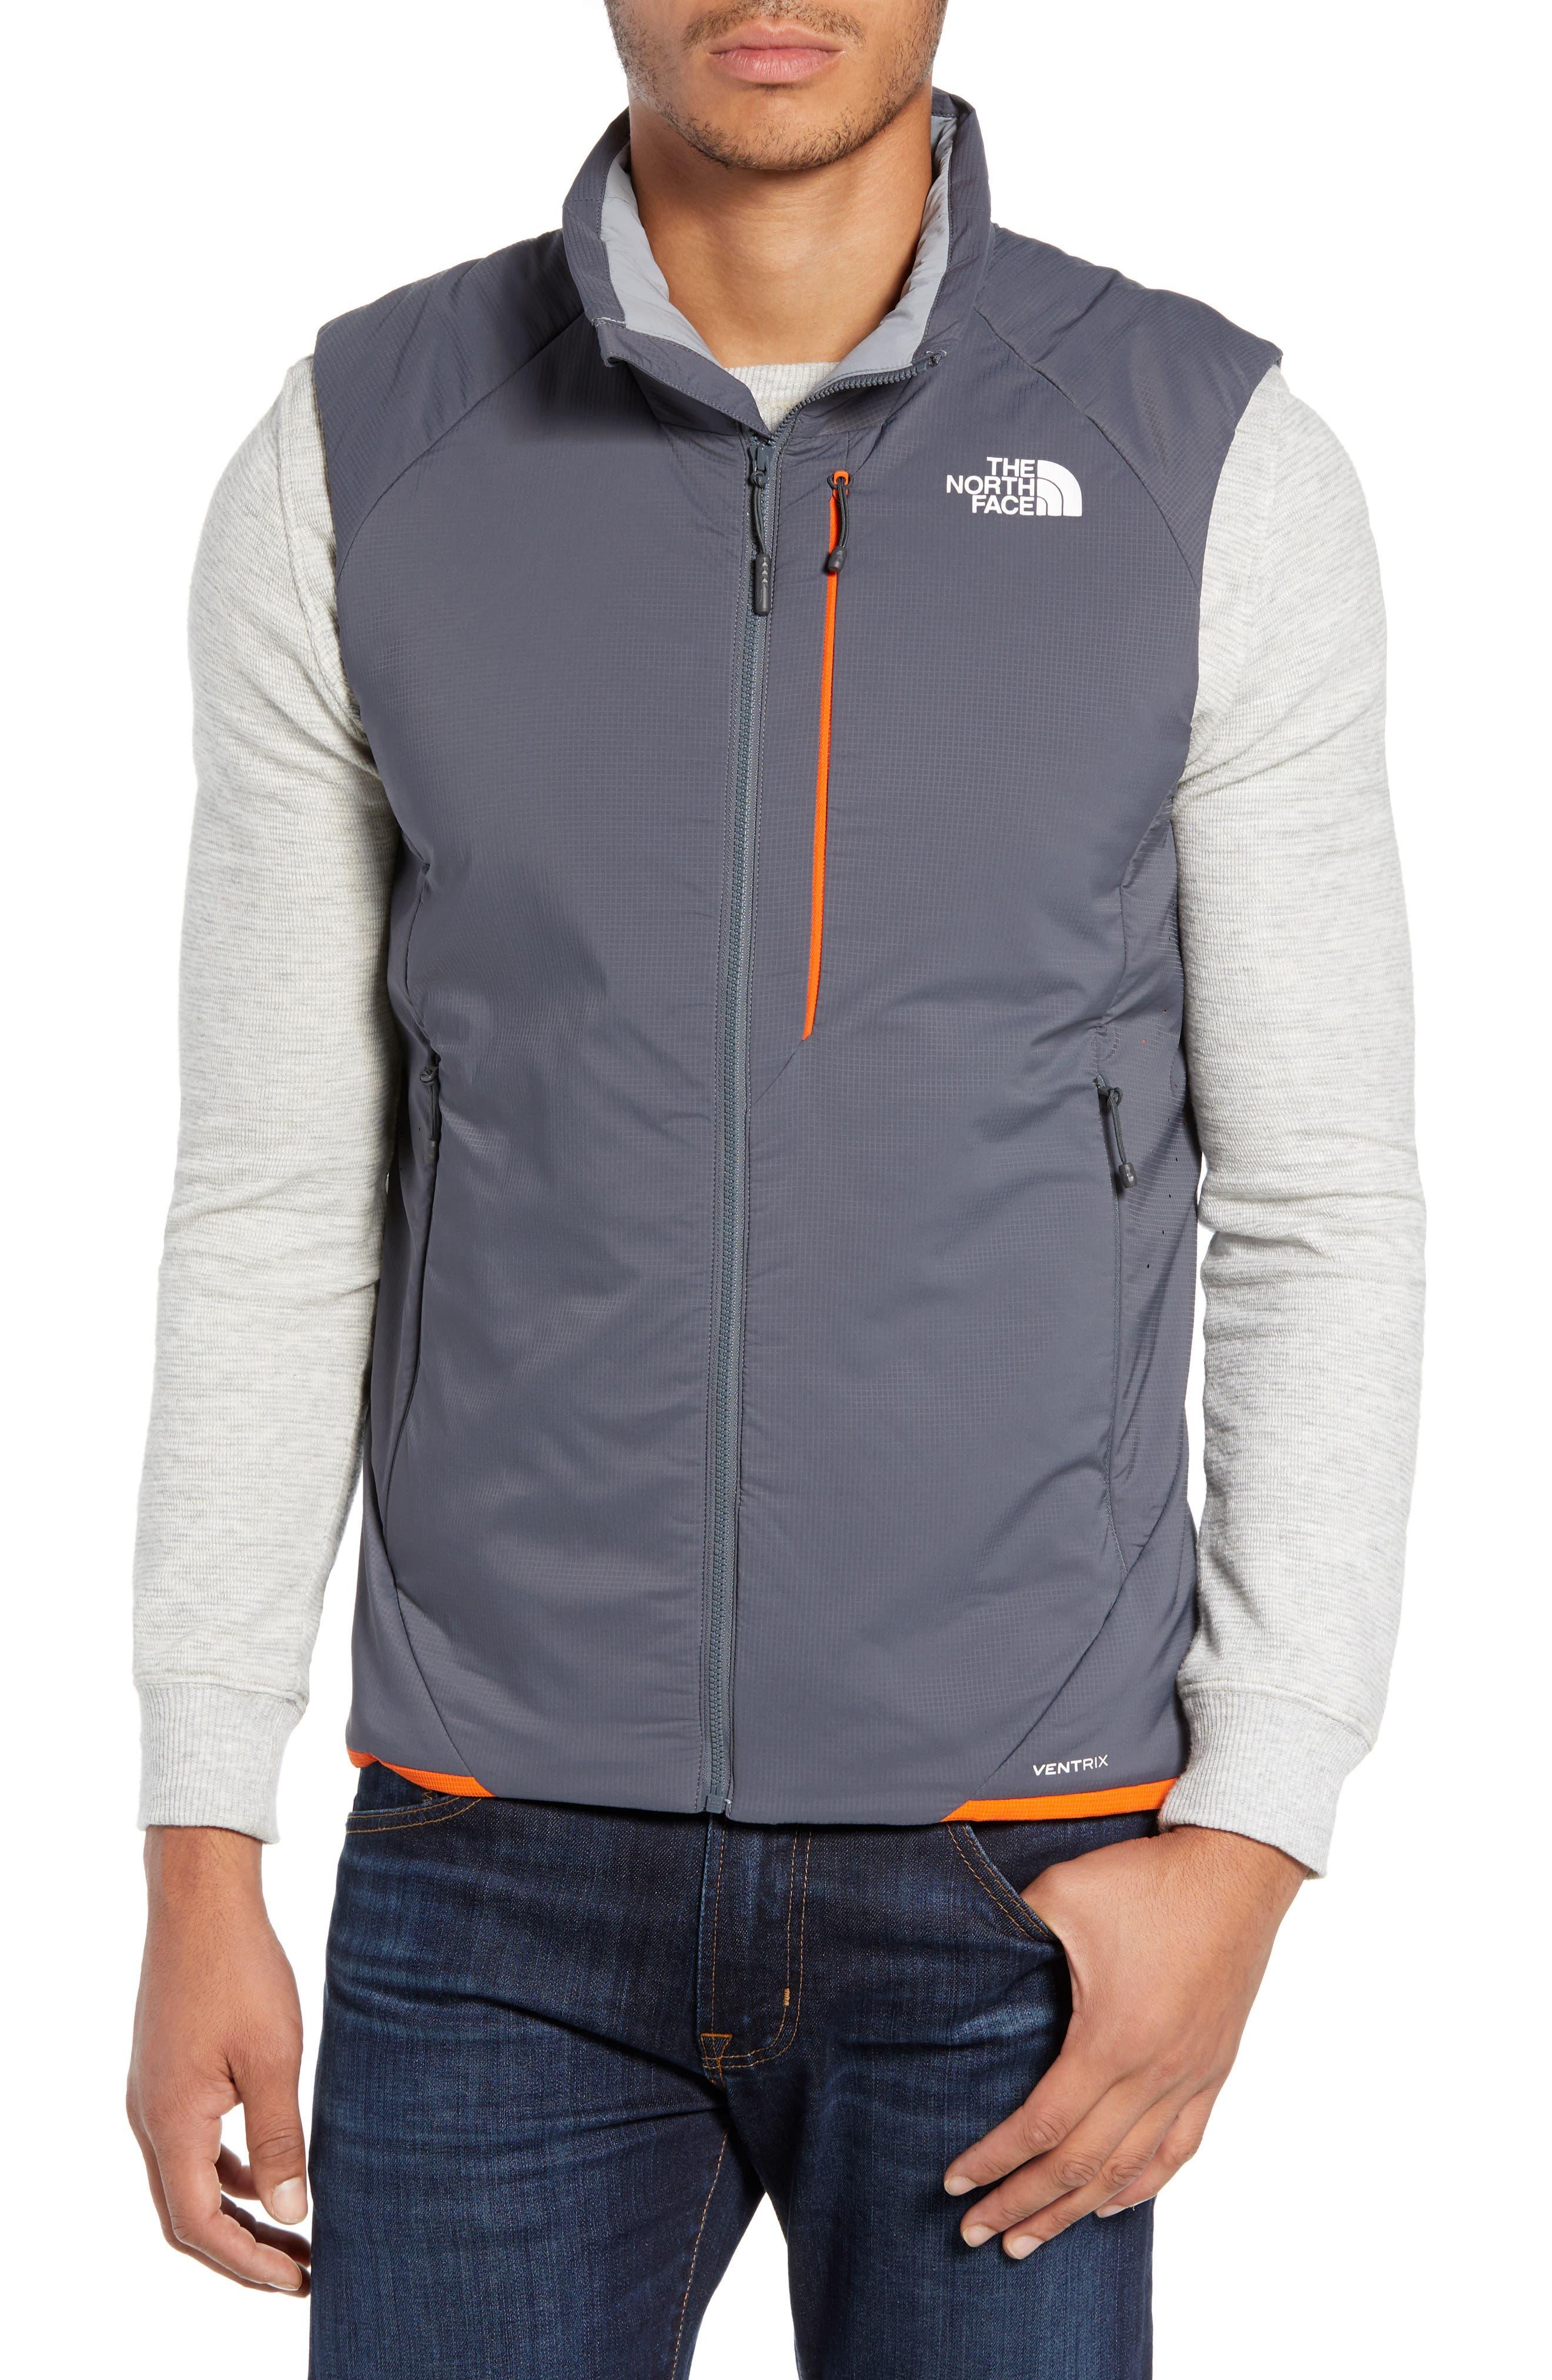 The North Face Ventrix(TM) Vest